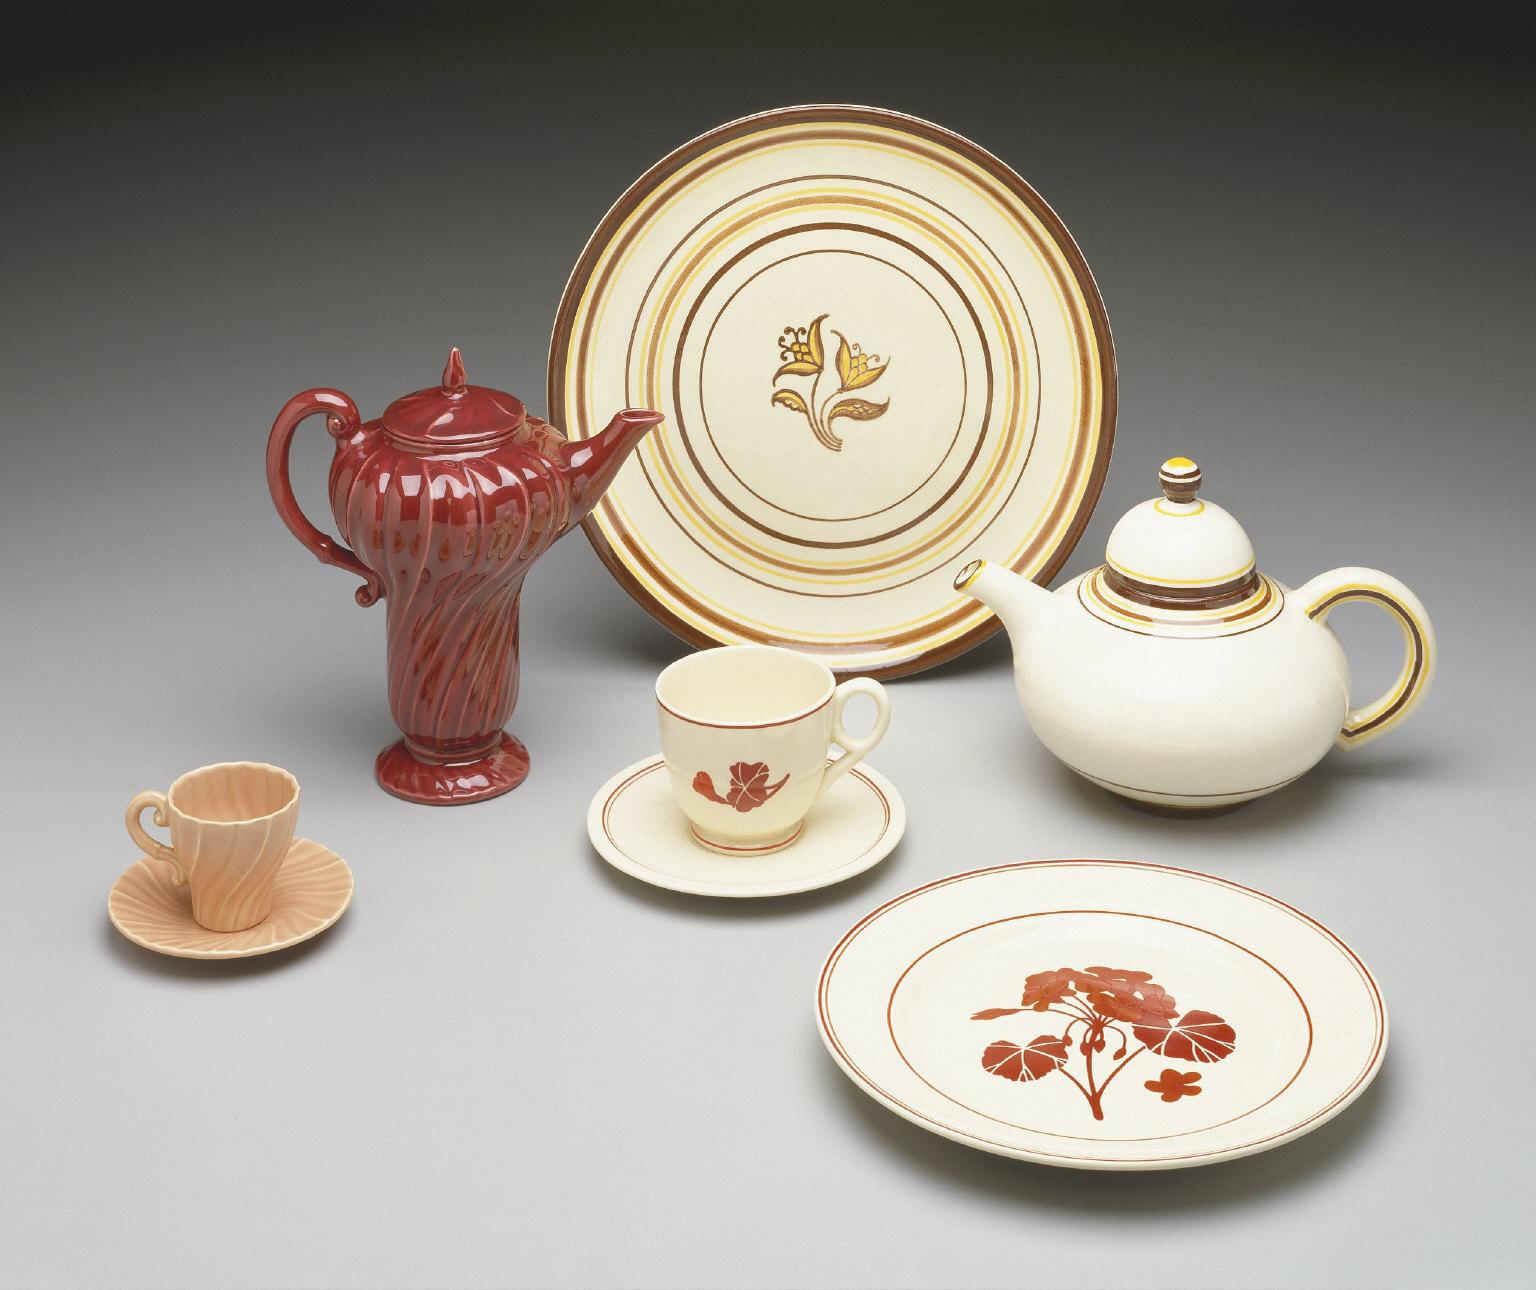 'El Patio' shape teapot with 'Padua' pattern